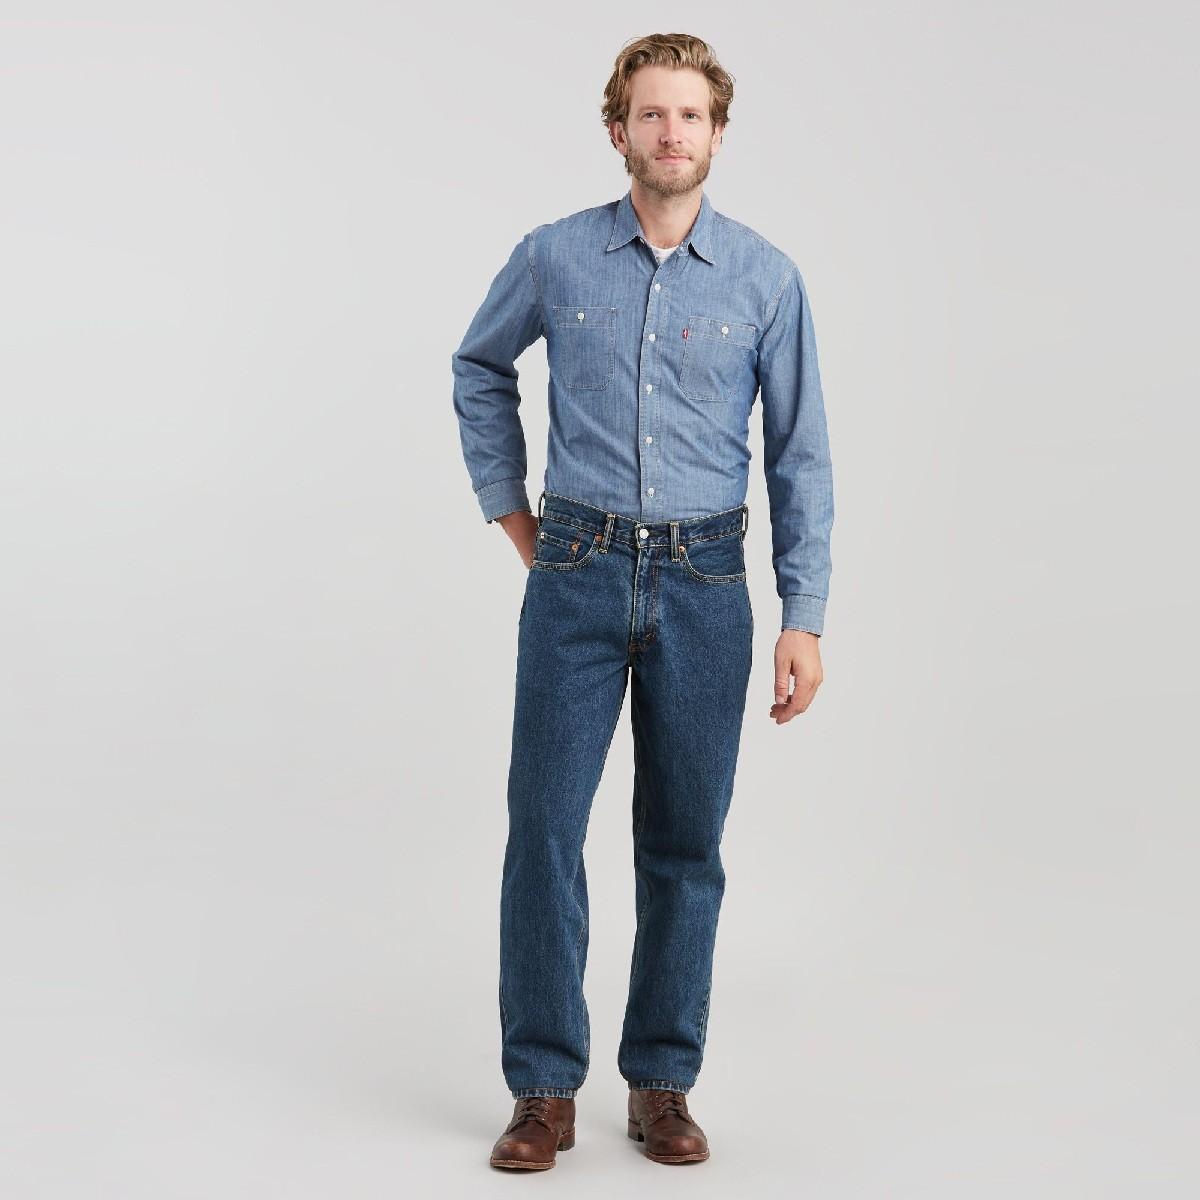 Мужские джинсы 560 Loose Fit Tapered Leg 00560-4886 1